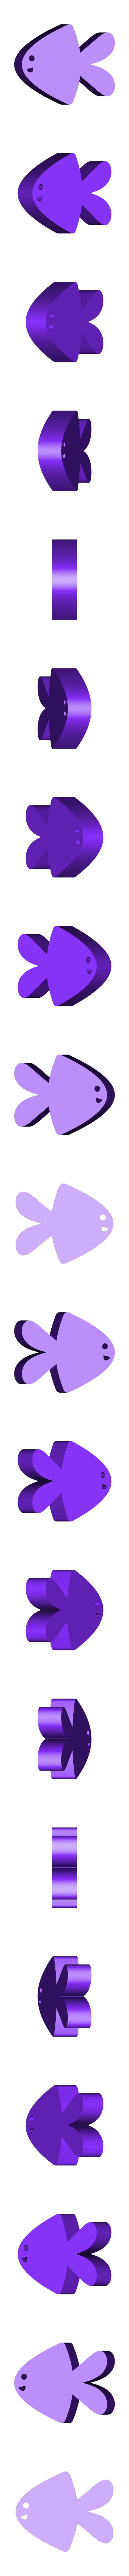 fish_full.stl Download free STL file Tide the Fish • Design to 3D print, Tarnliare